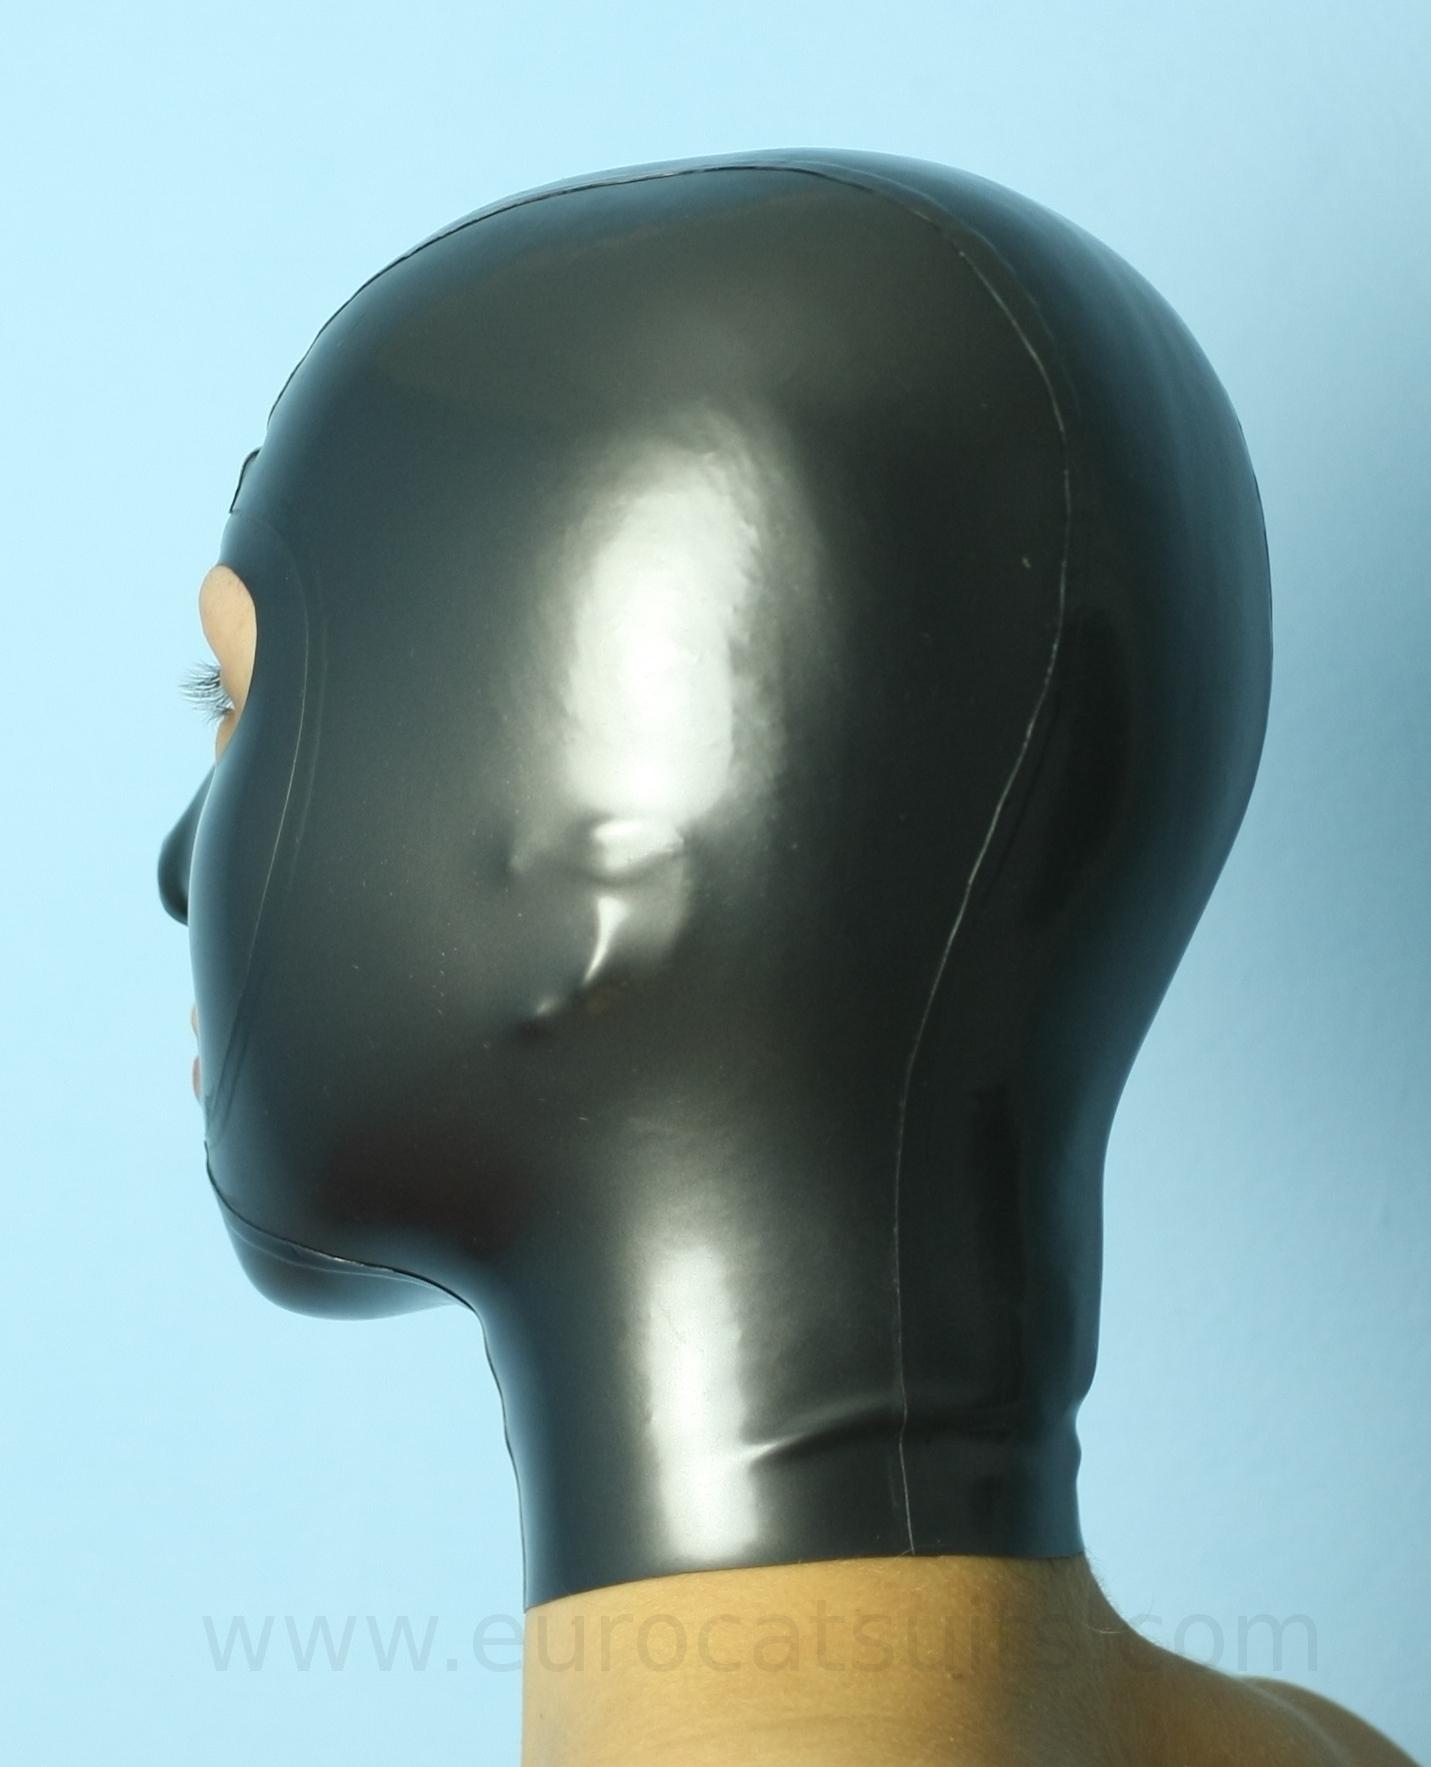 Think, A latex mask amusing